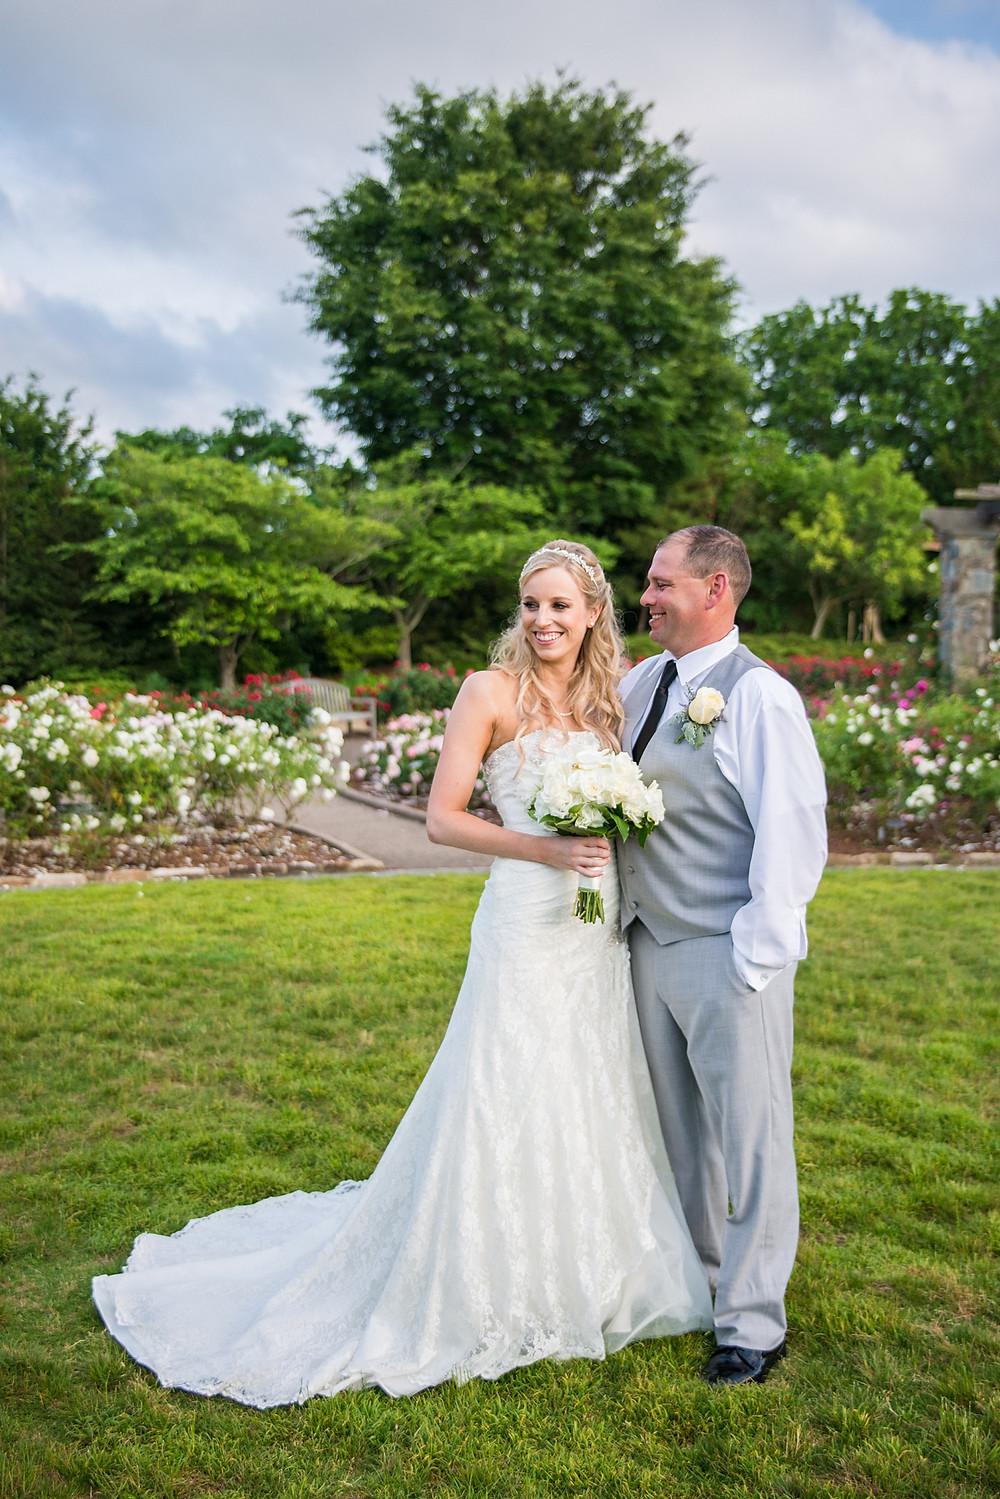 Lewis Ginter Botanical Garden Richmond VA engagement photography